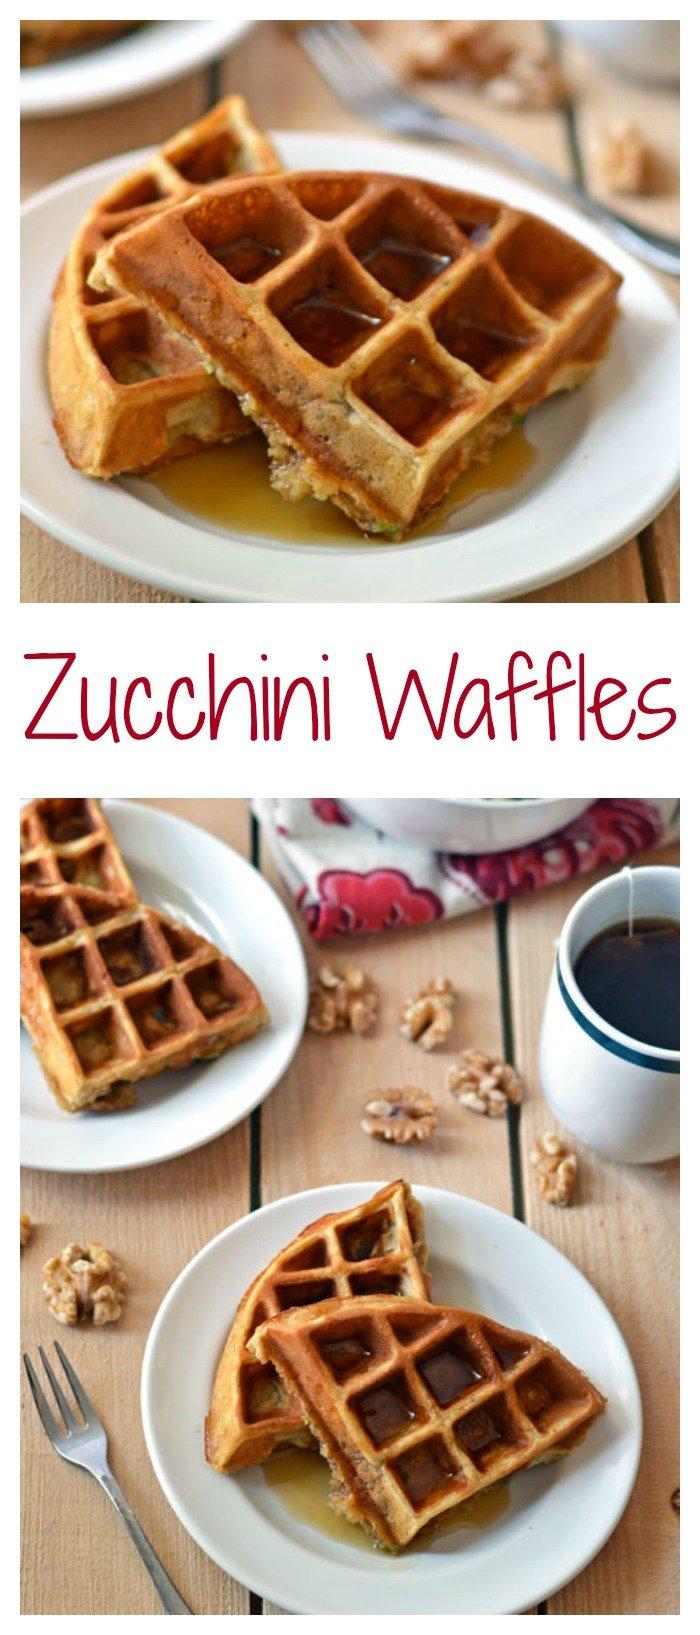 Zucchini Waffles // Well-Plated